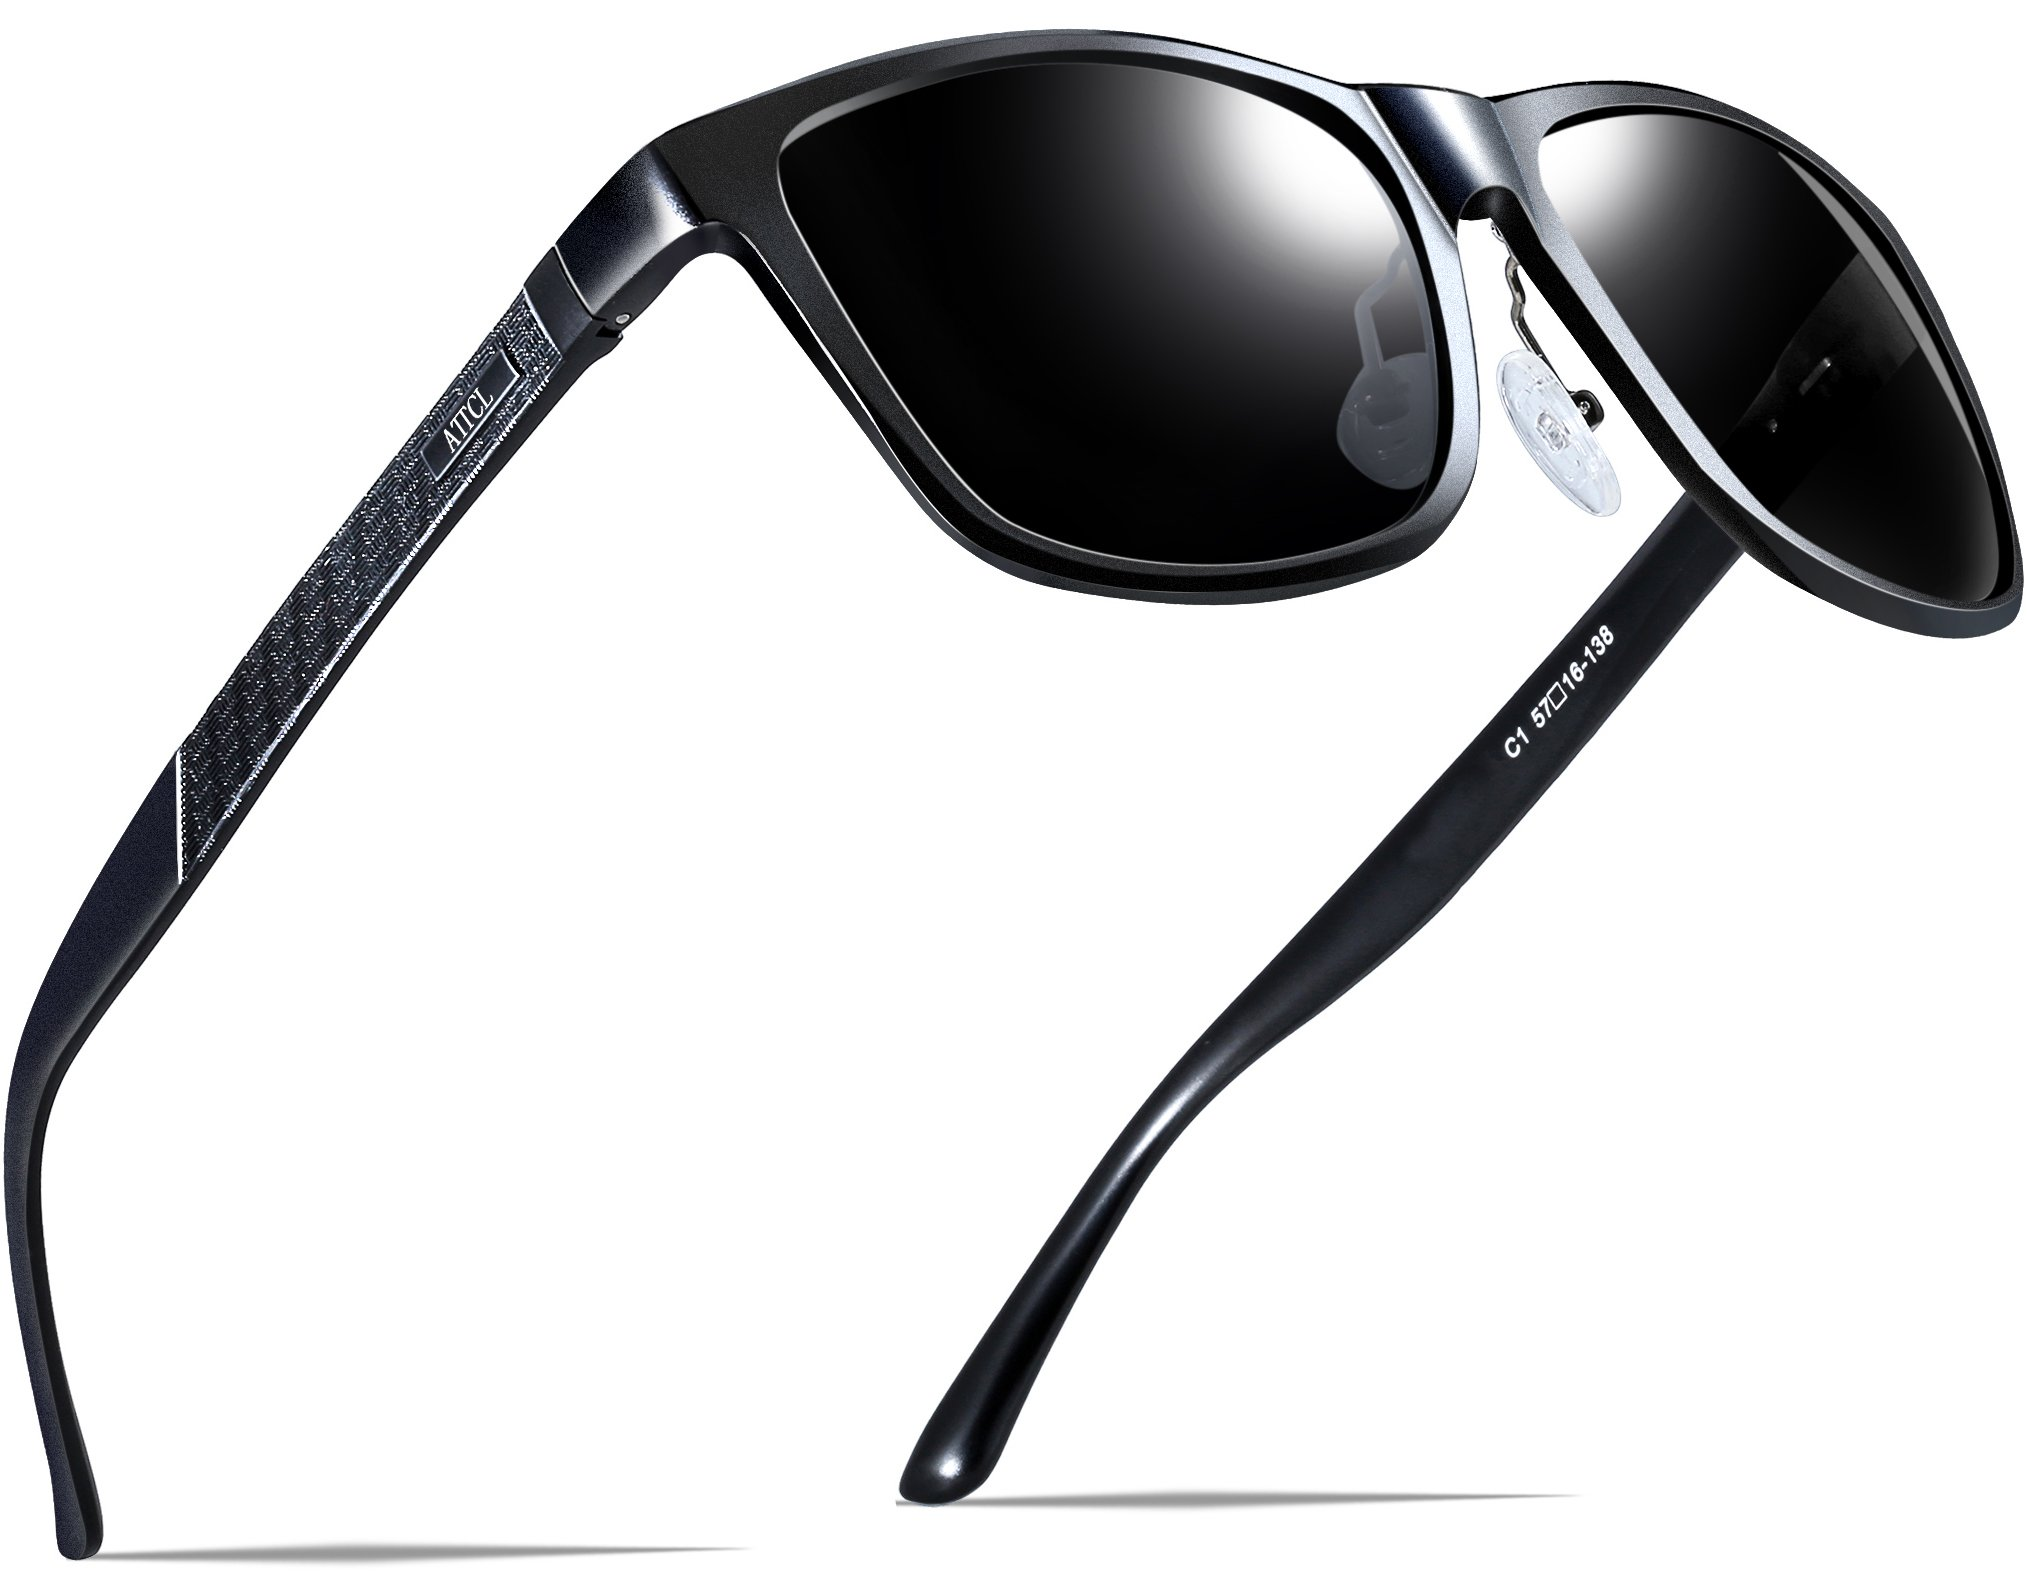 ATTCL Men's Hot Retro Metal Frame Driving Polarized Wayfarer Sunglasses For Men 18587black by ATTCL (Image #2)